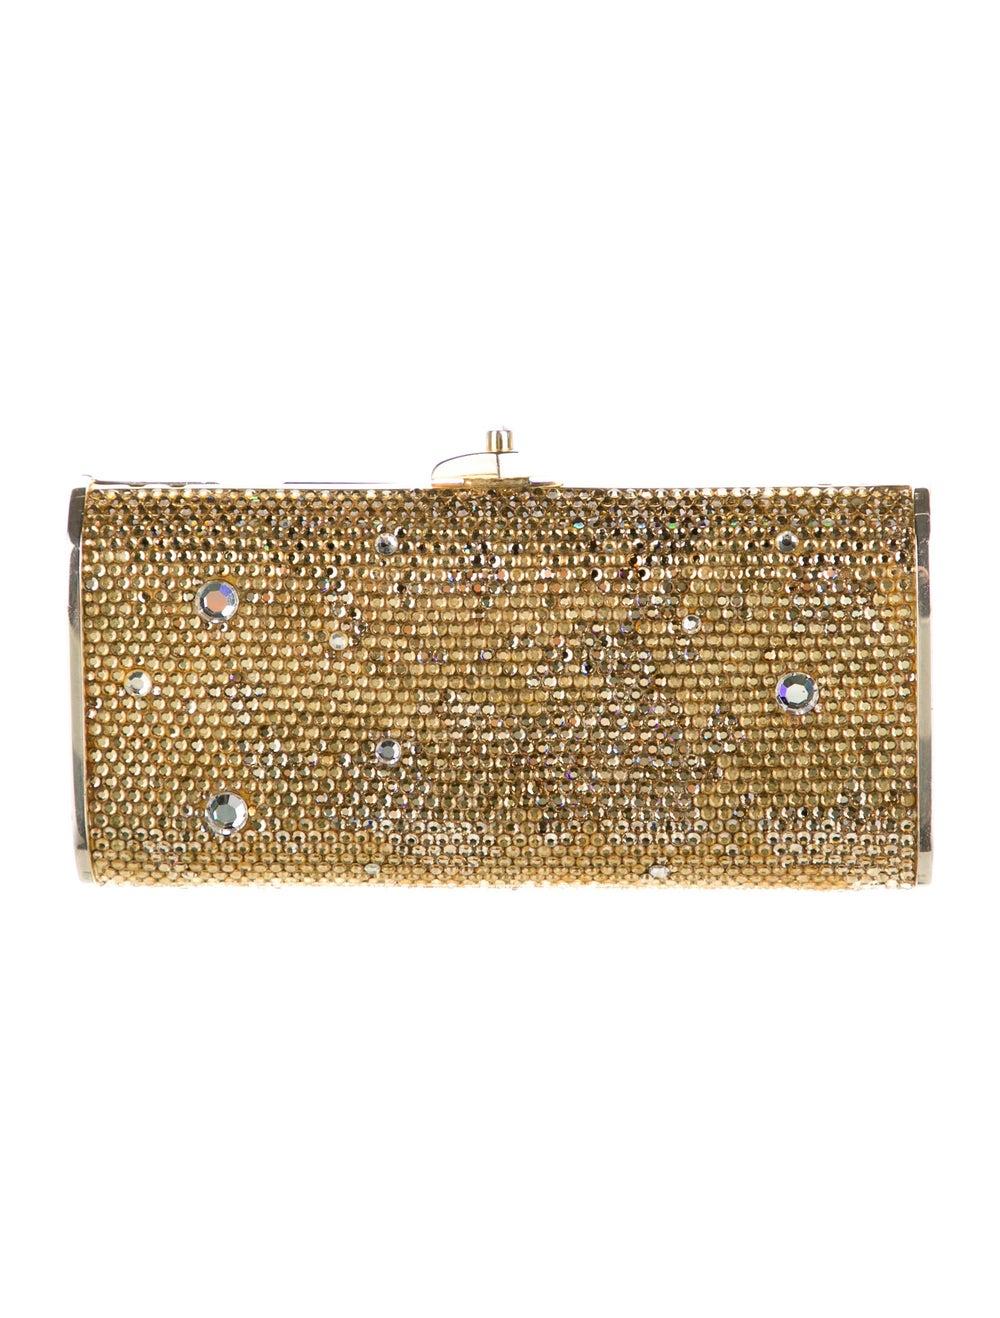 Judith Leiber Crystal Embellished Box Clutch Gold - image 4